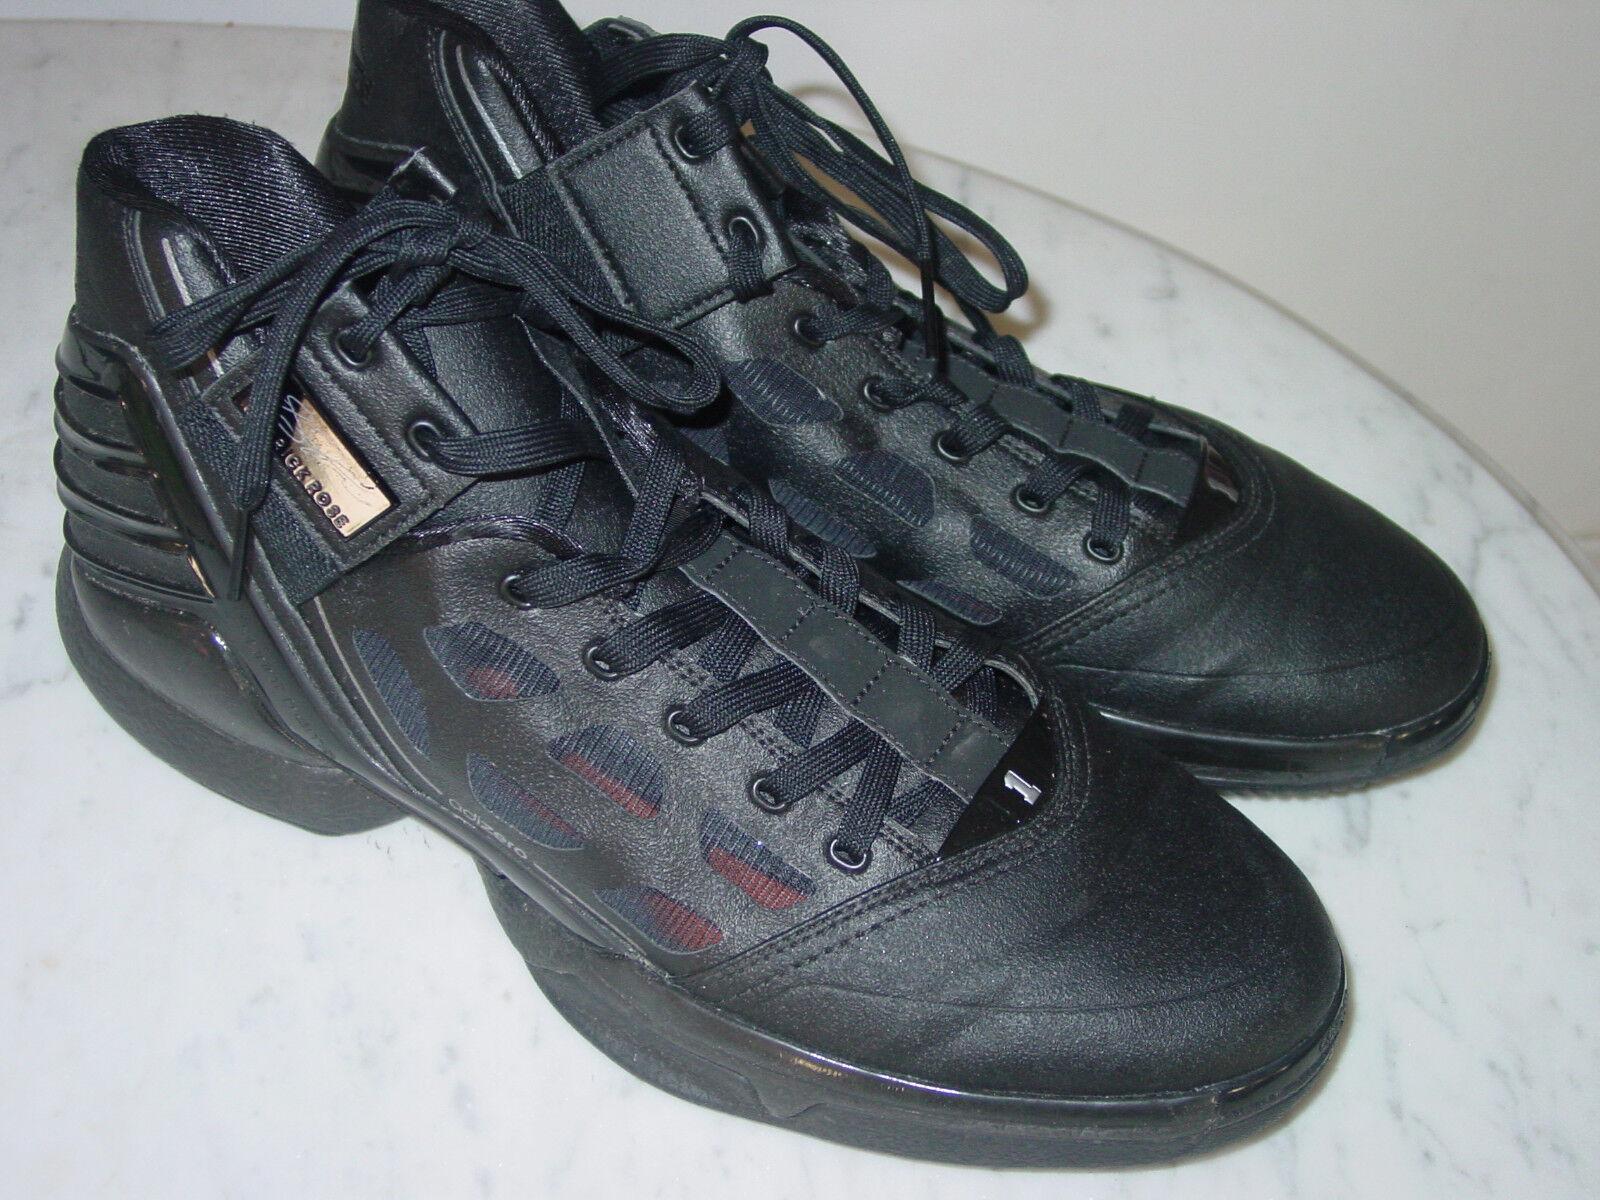 2011 adidas g49388 adizero derrick rose 2 g49388 adidas c4494a